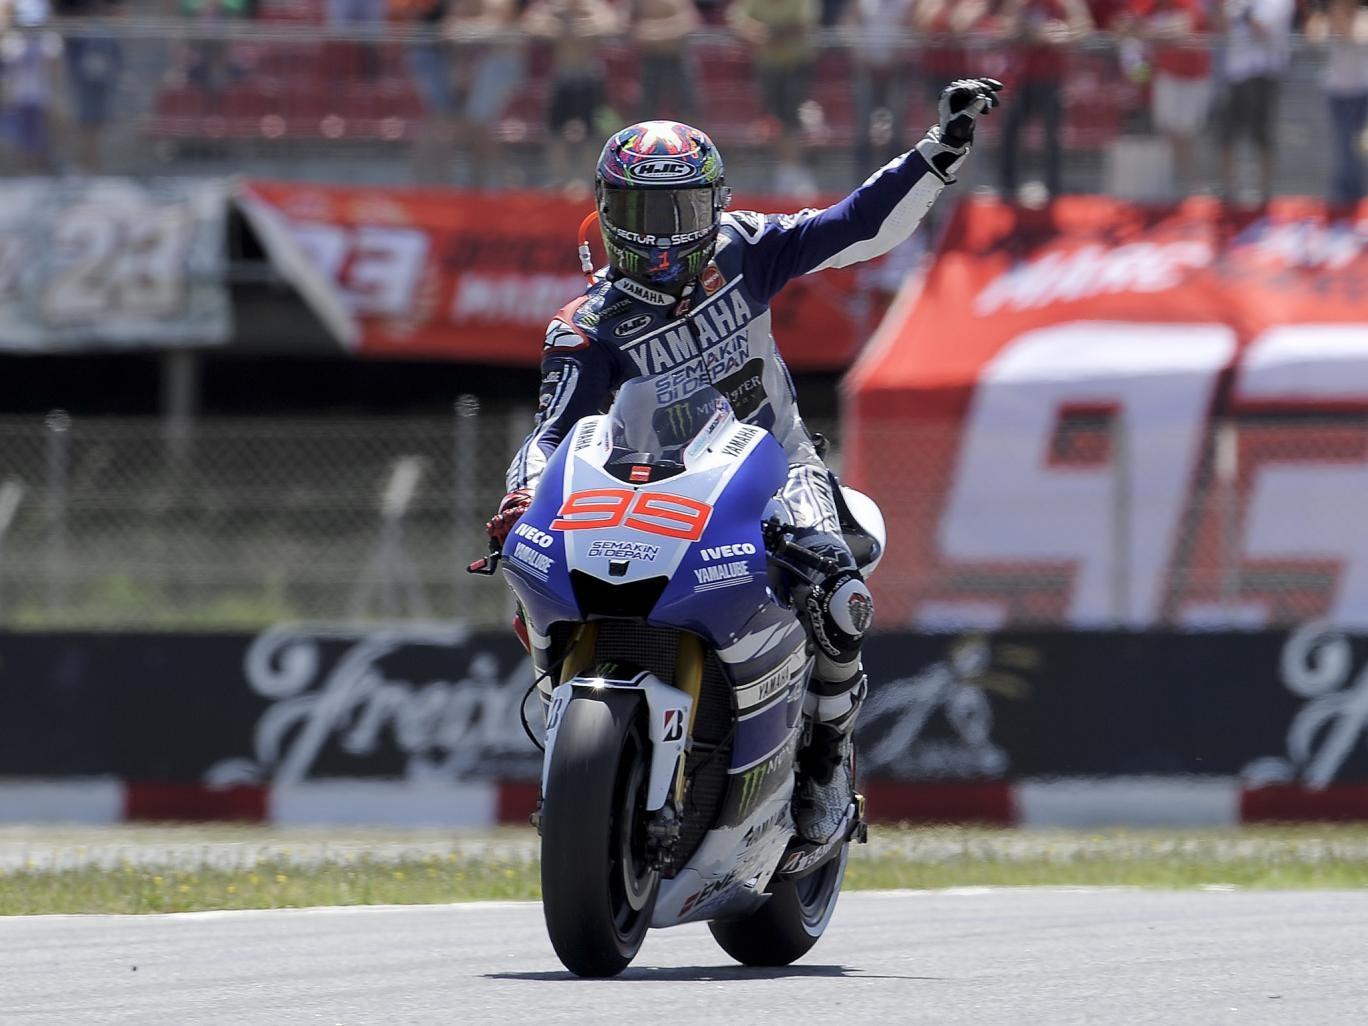 Jorge Lorenzo salutes the Barcelona crowd